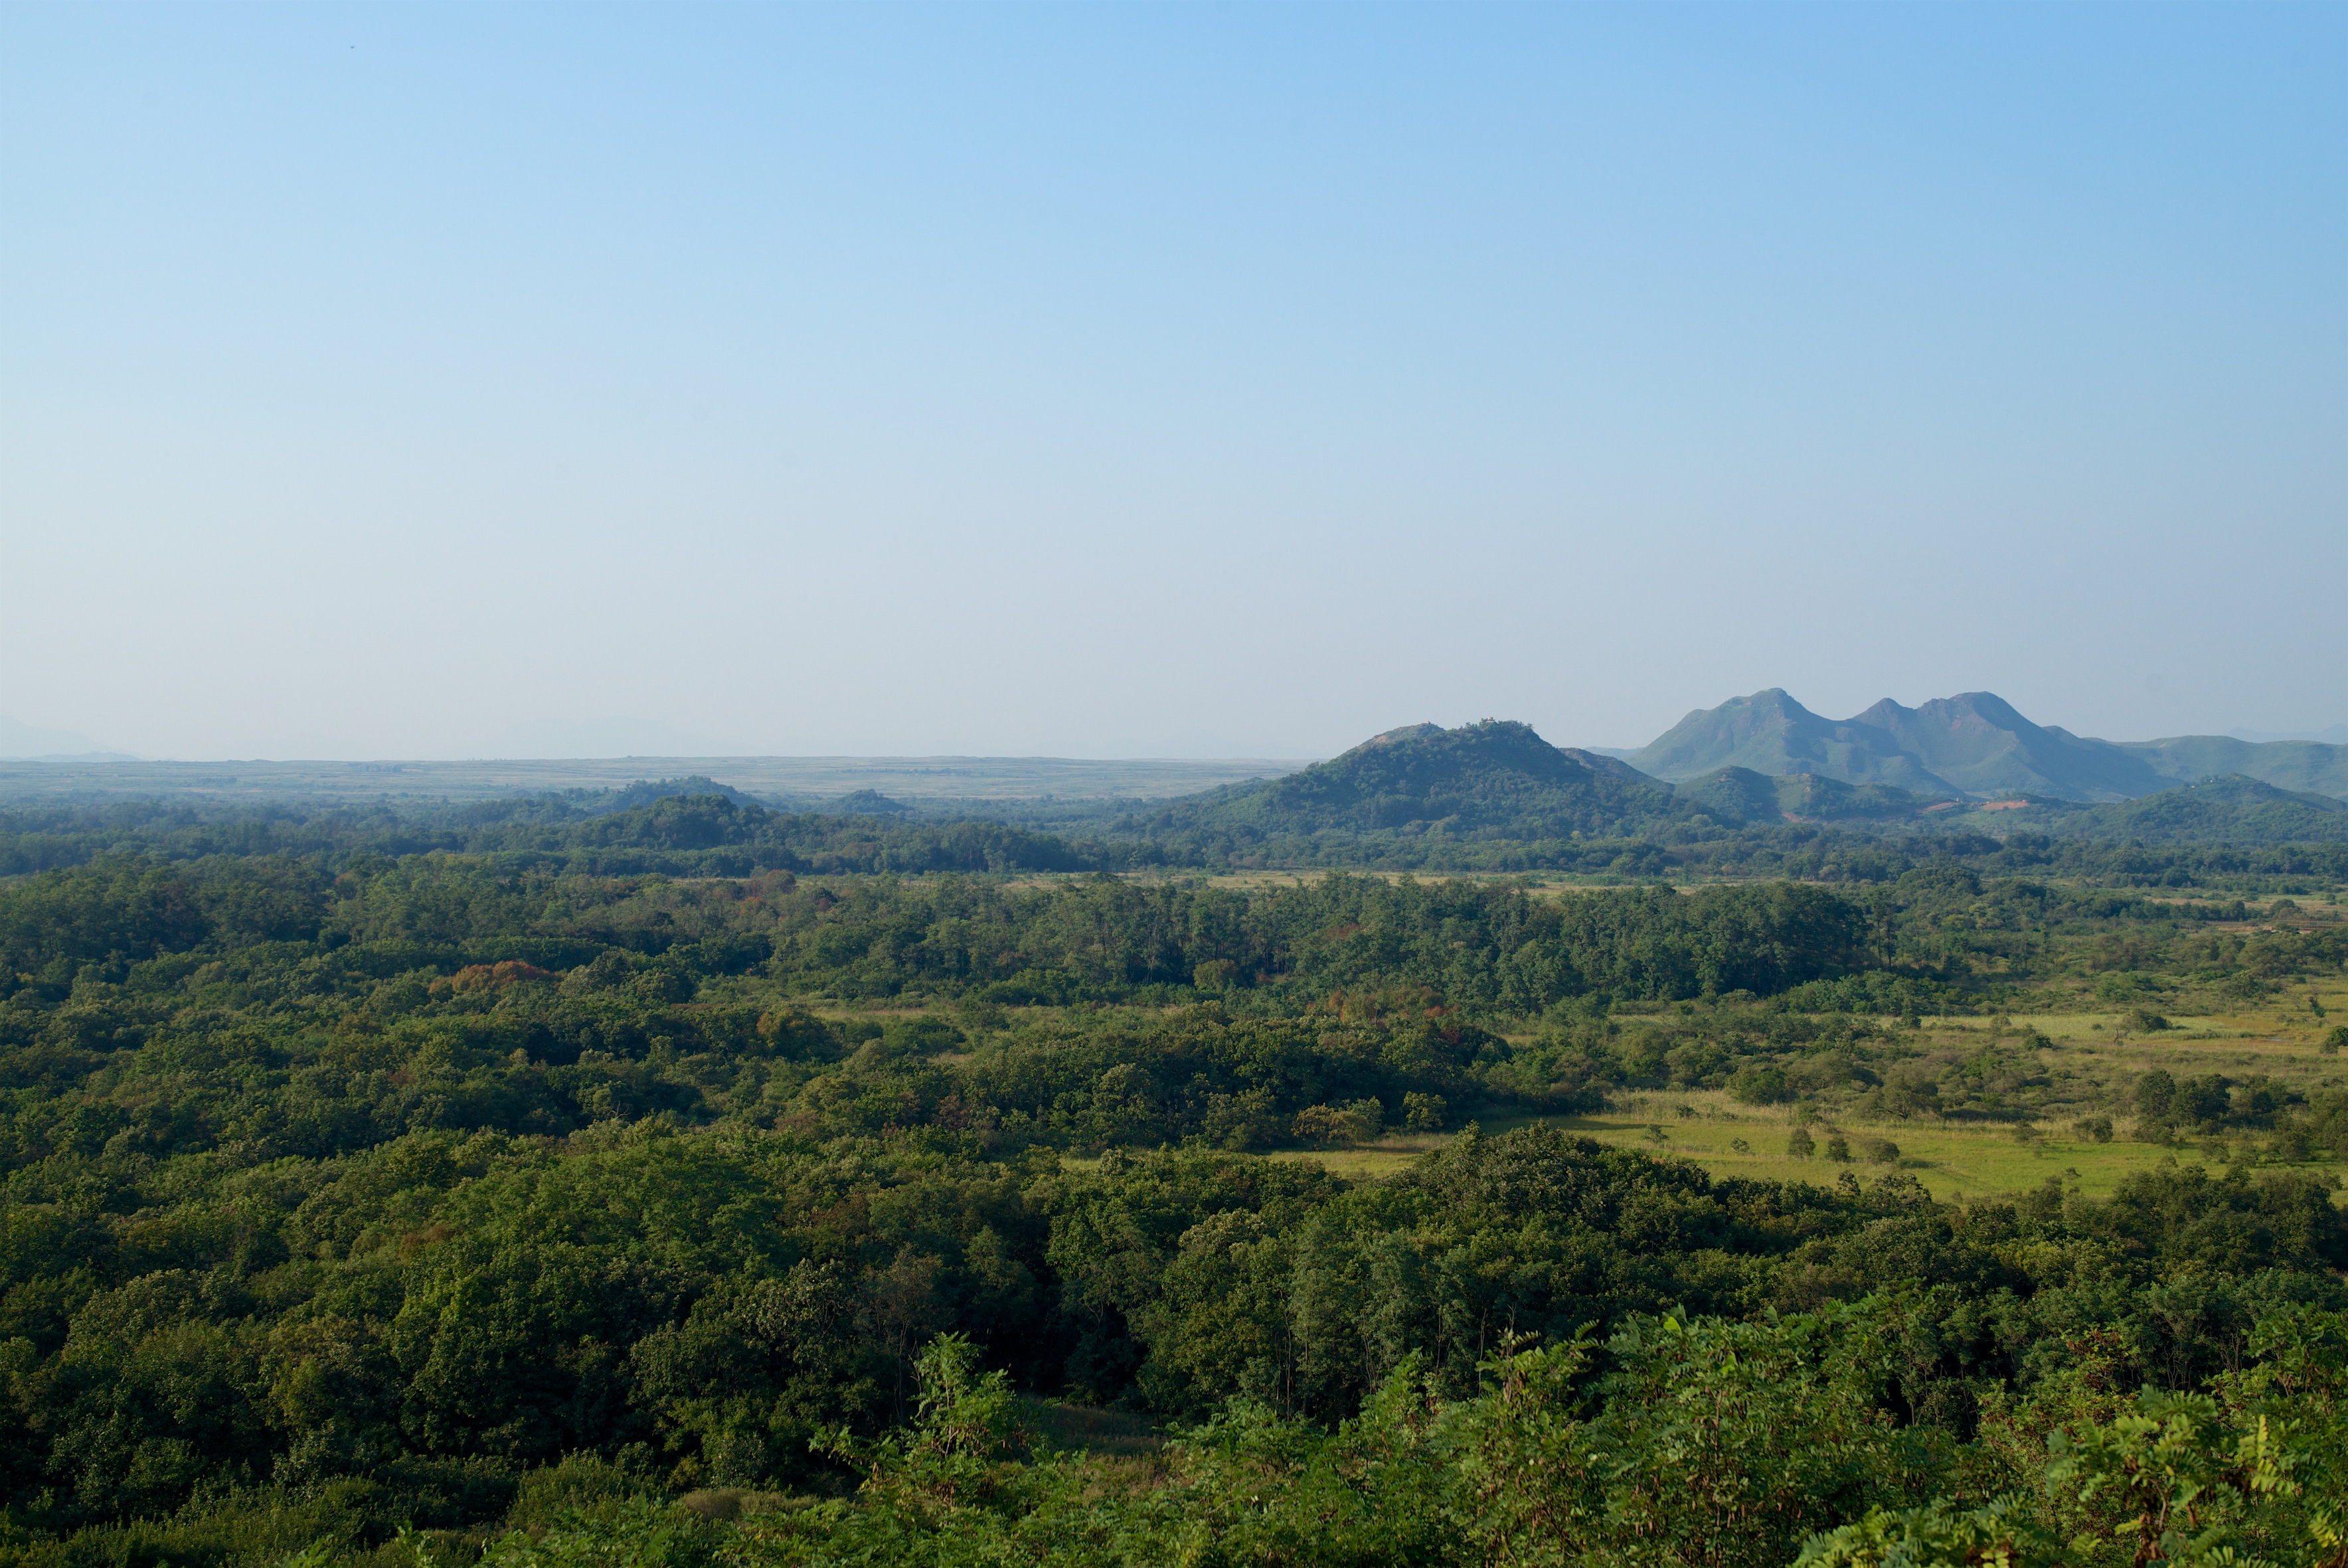 View towards North Korea